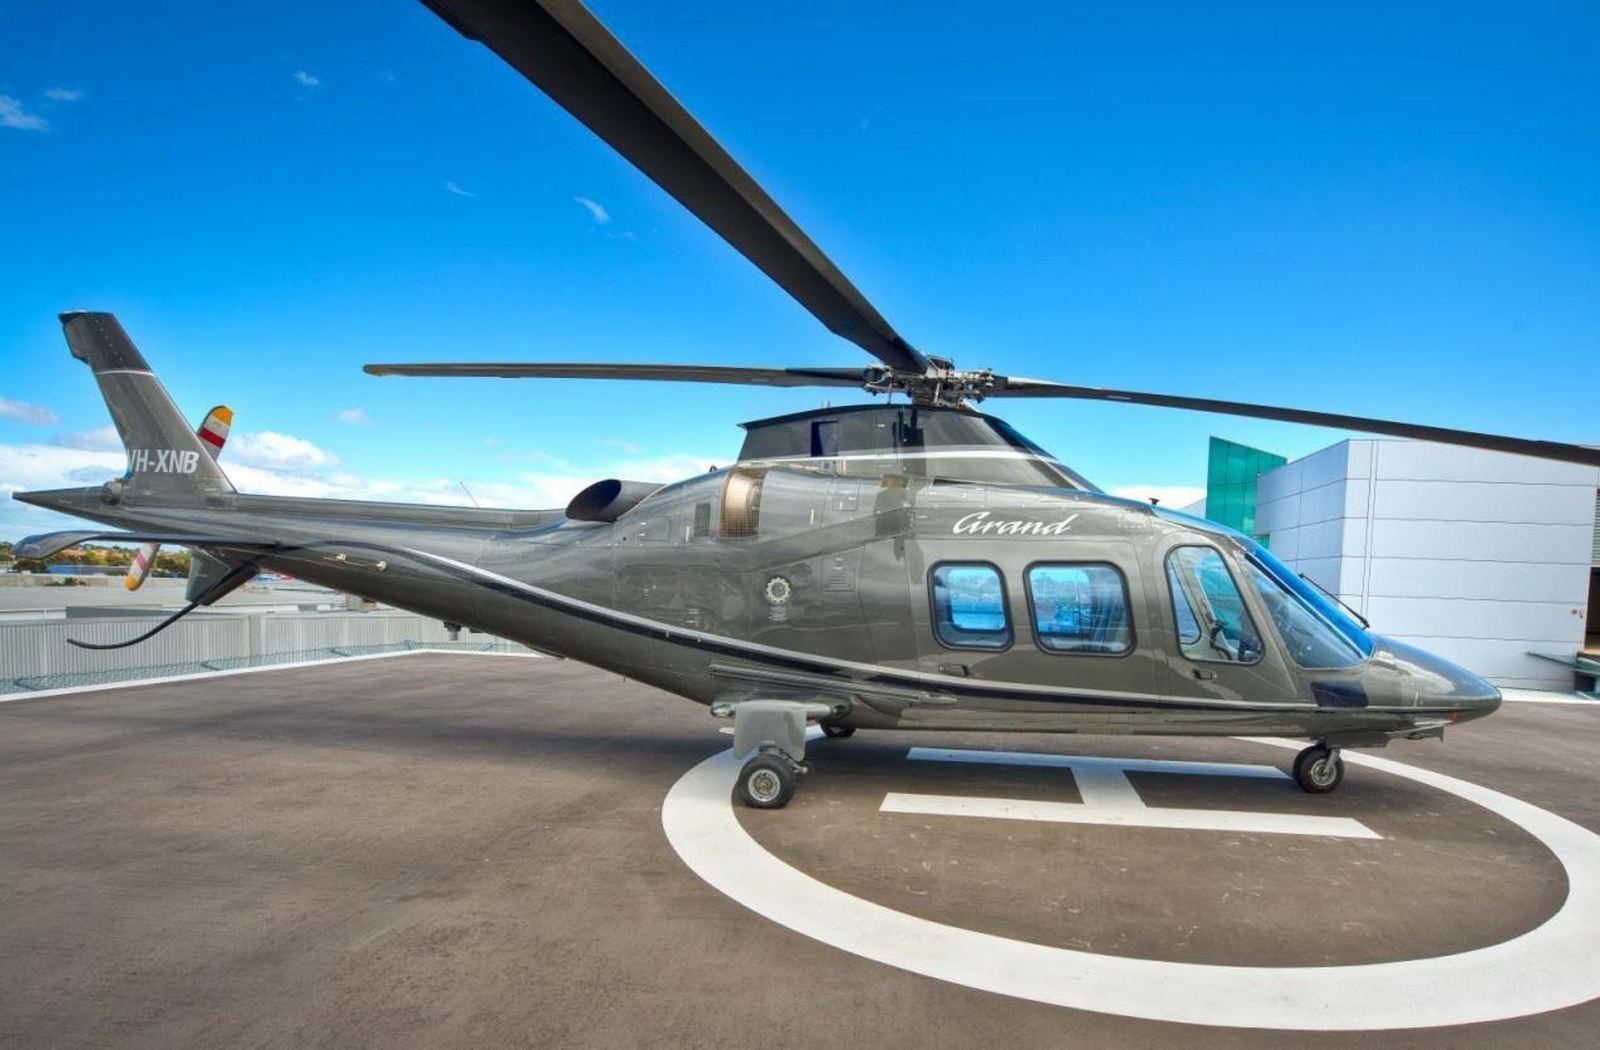 Agusta Westland 109 Helicopter